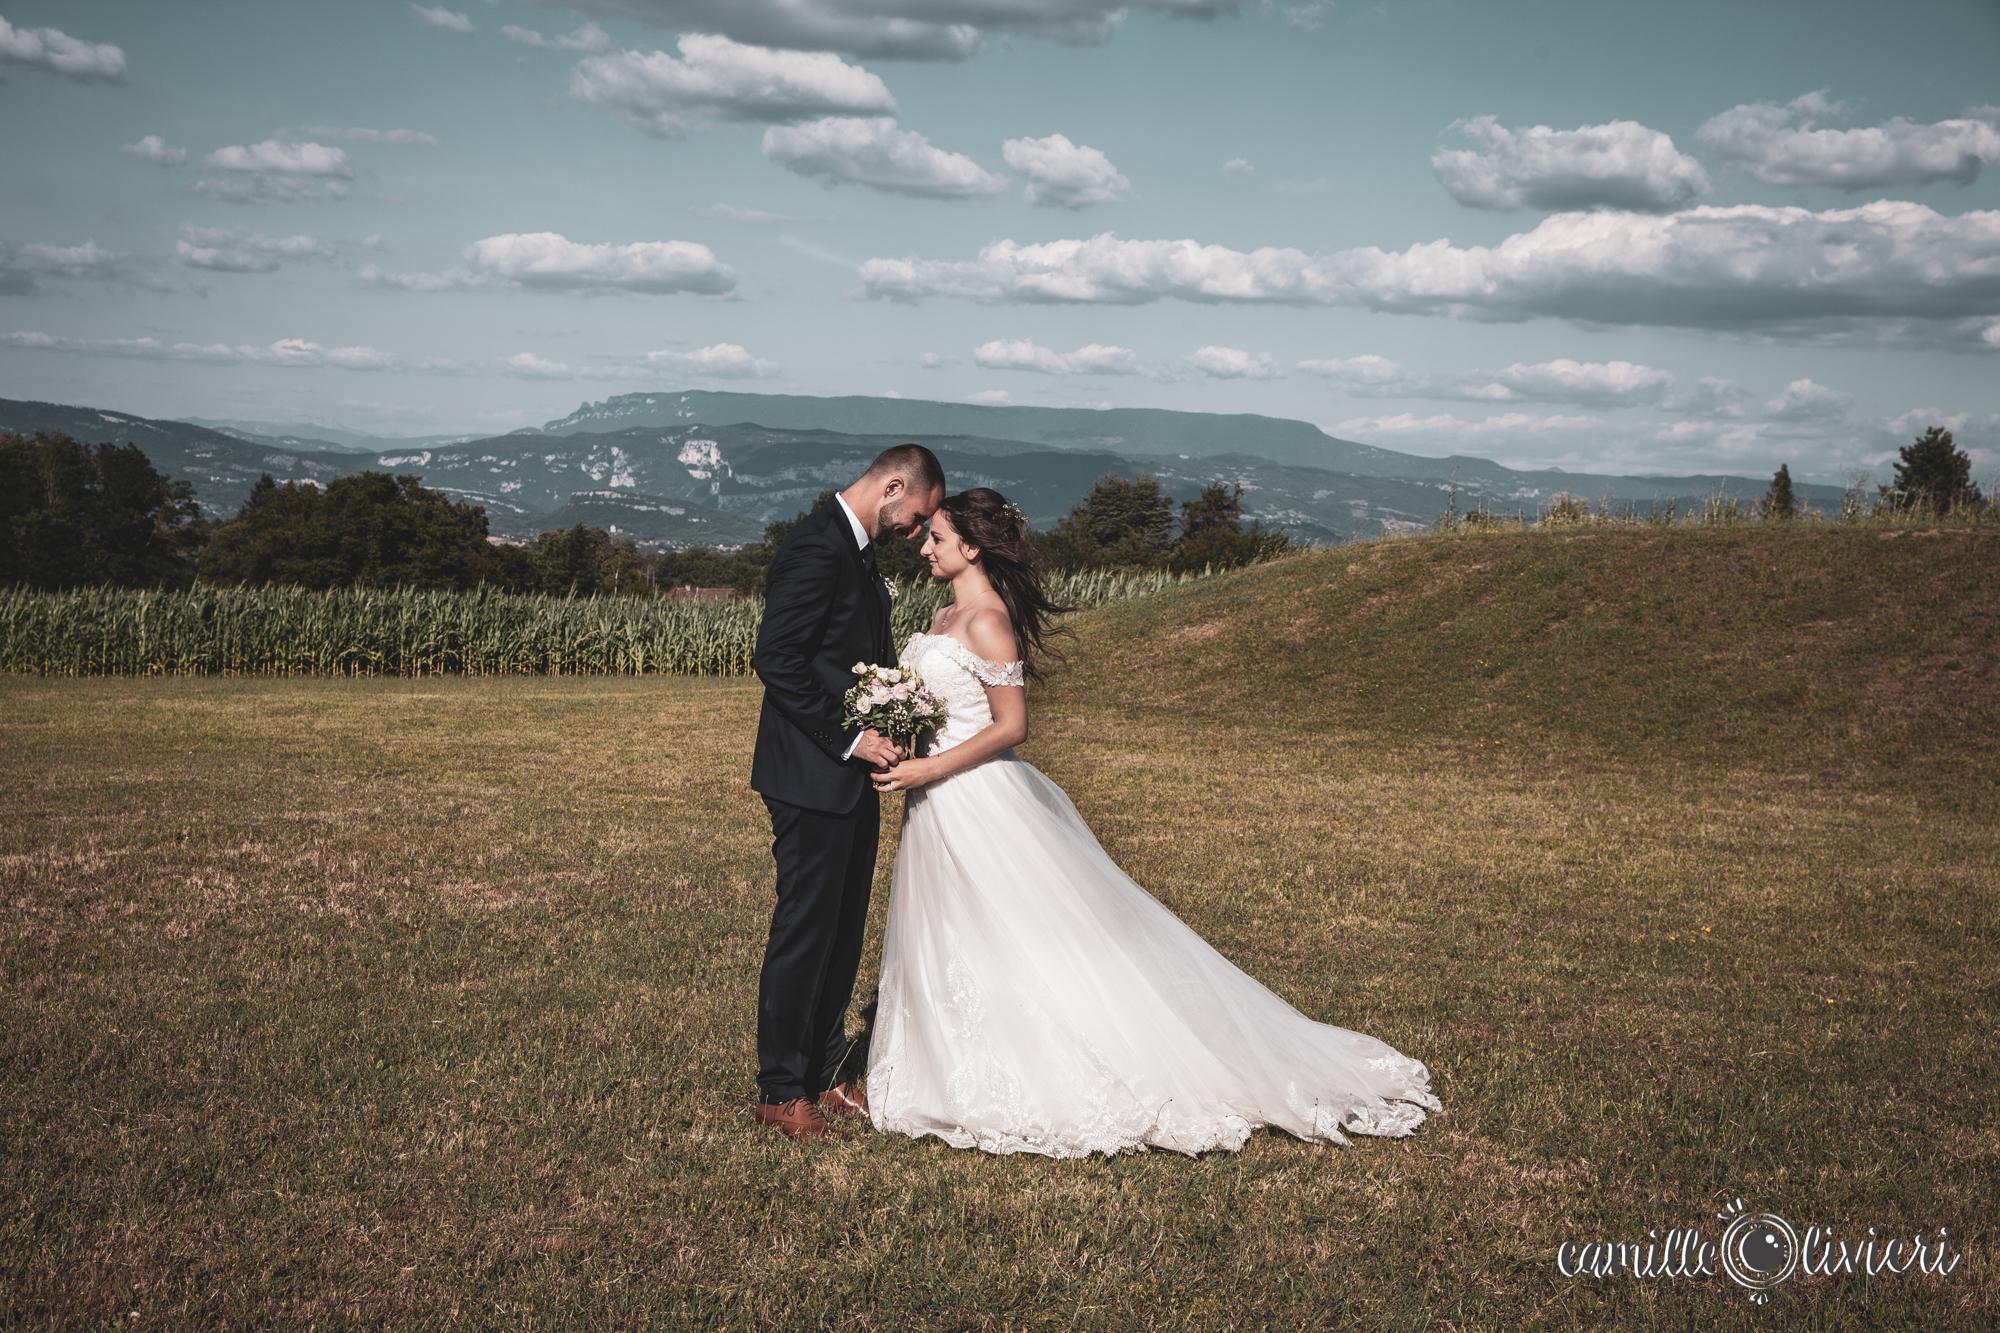 photographe_grenoble_mariage-camille-olivieri-65